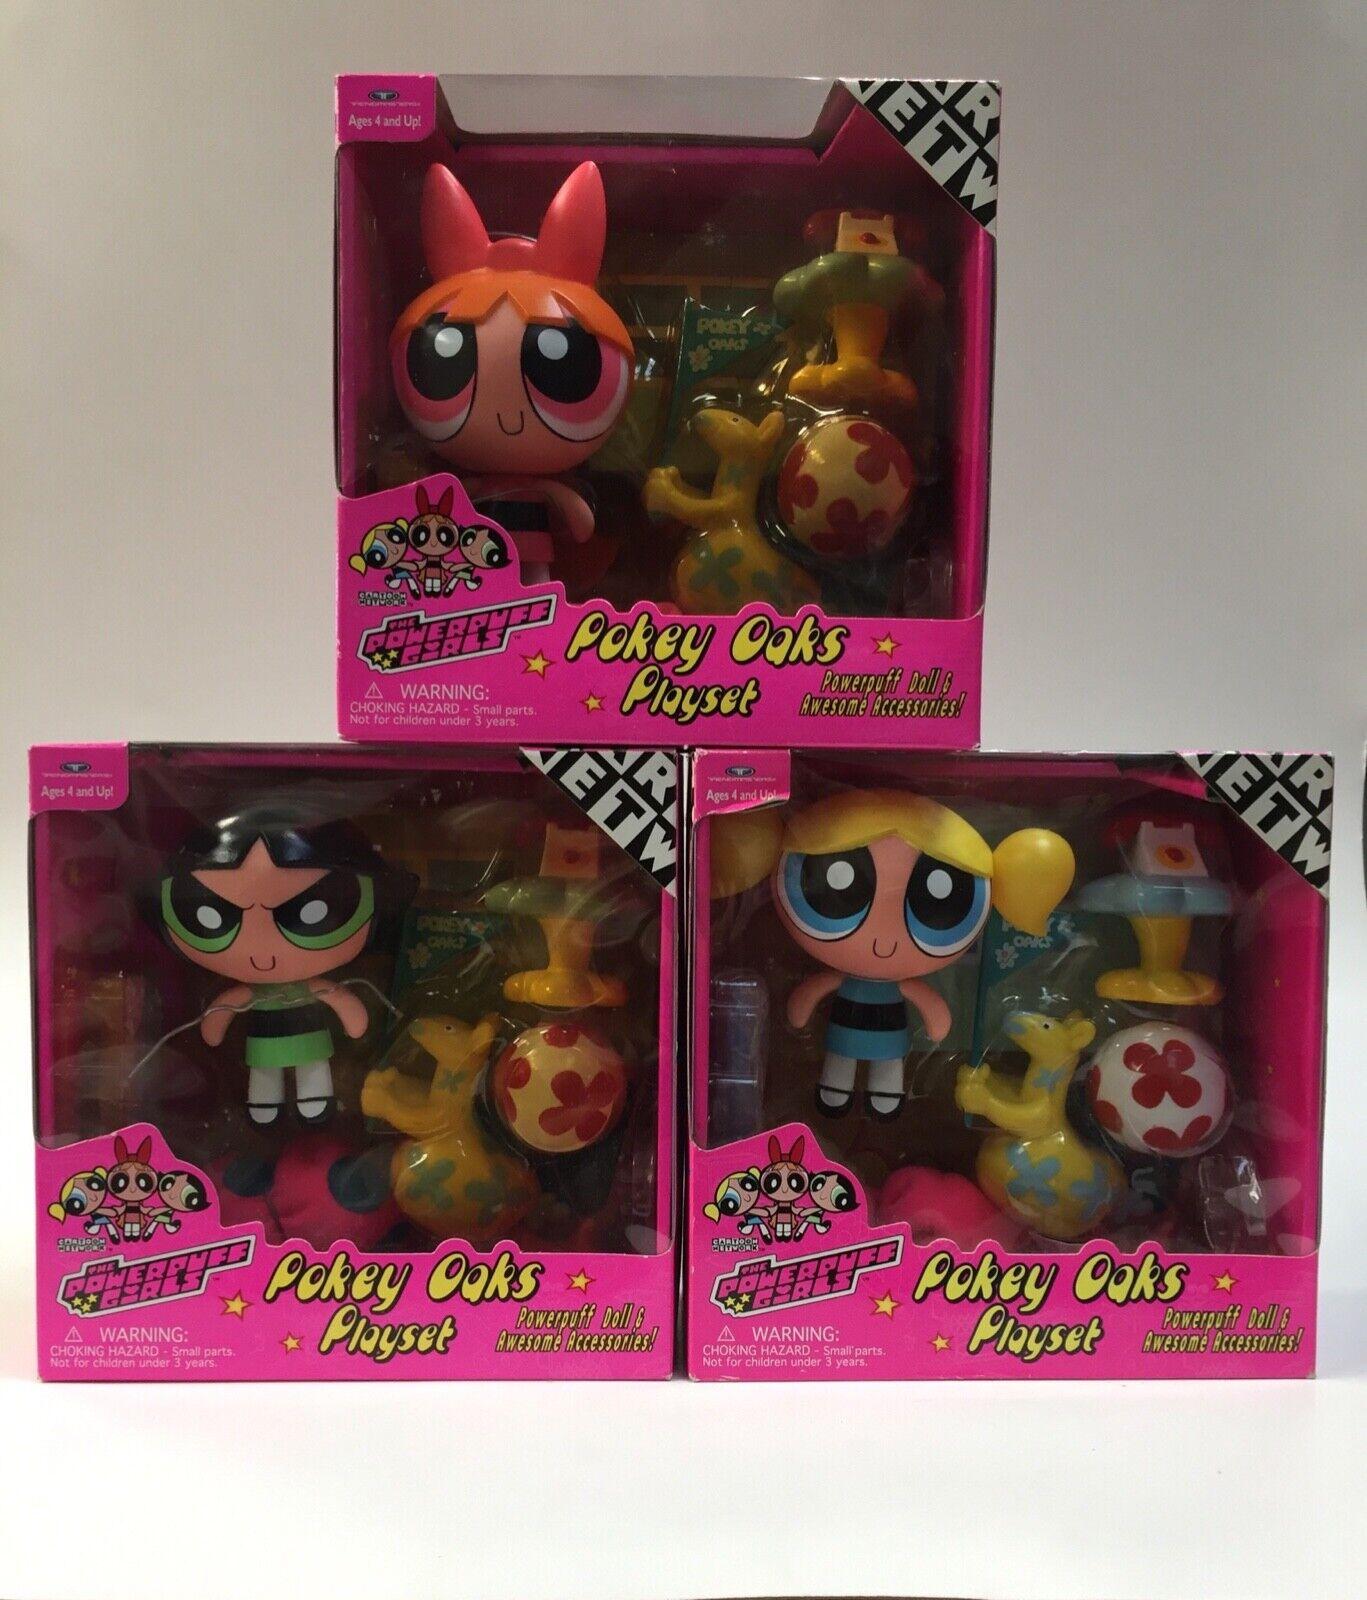 VTG Powerpuff Girls Pokey Oaks Playset Cartoon Network 1999 ALL THREE